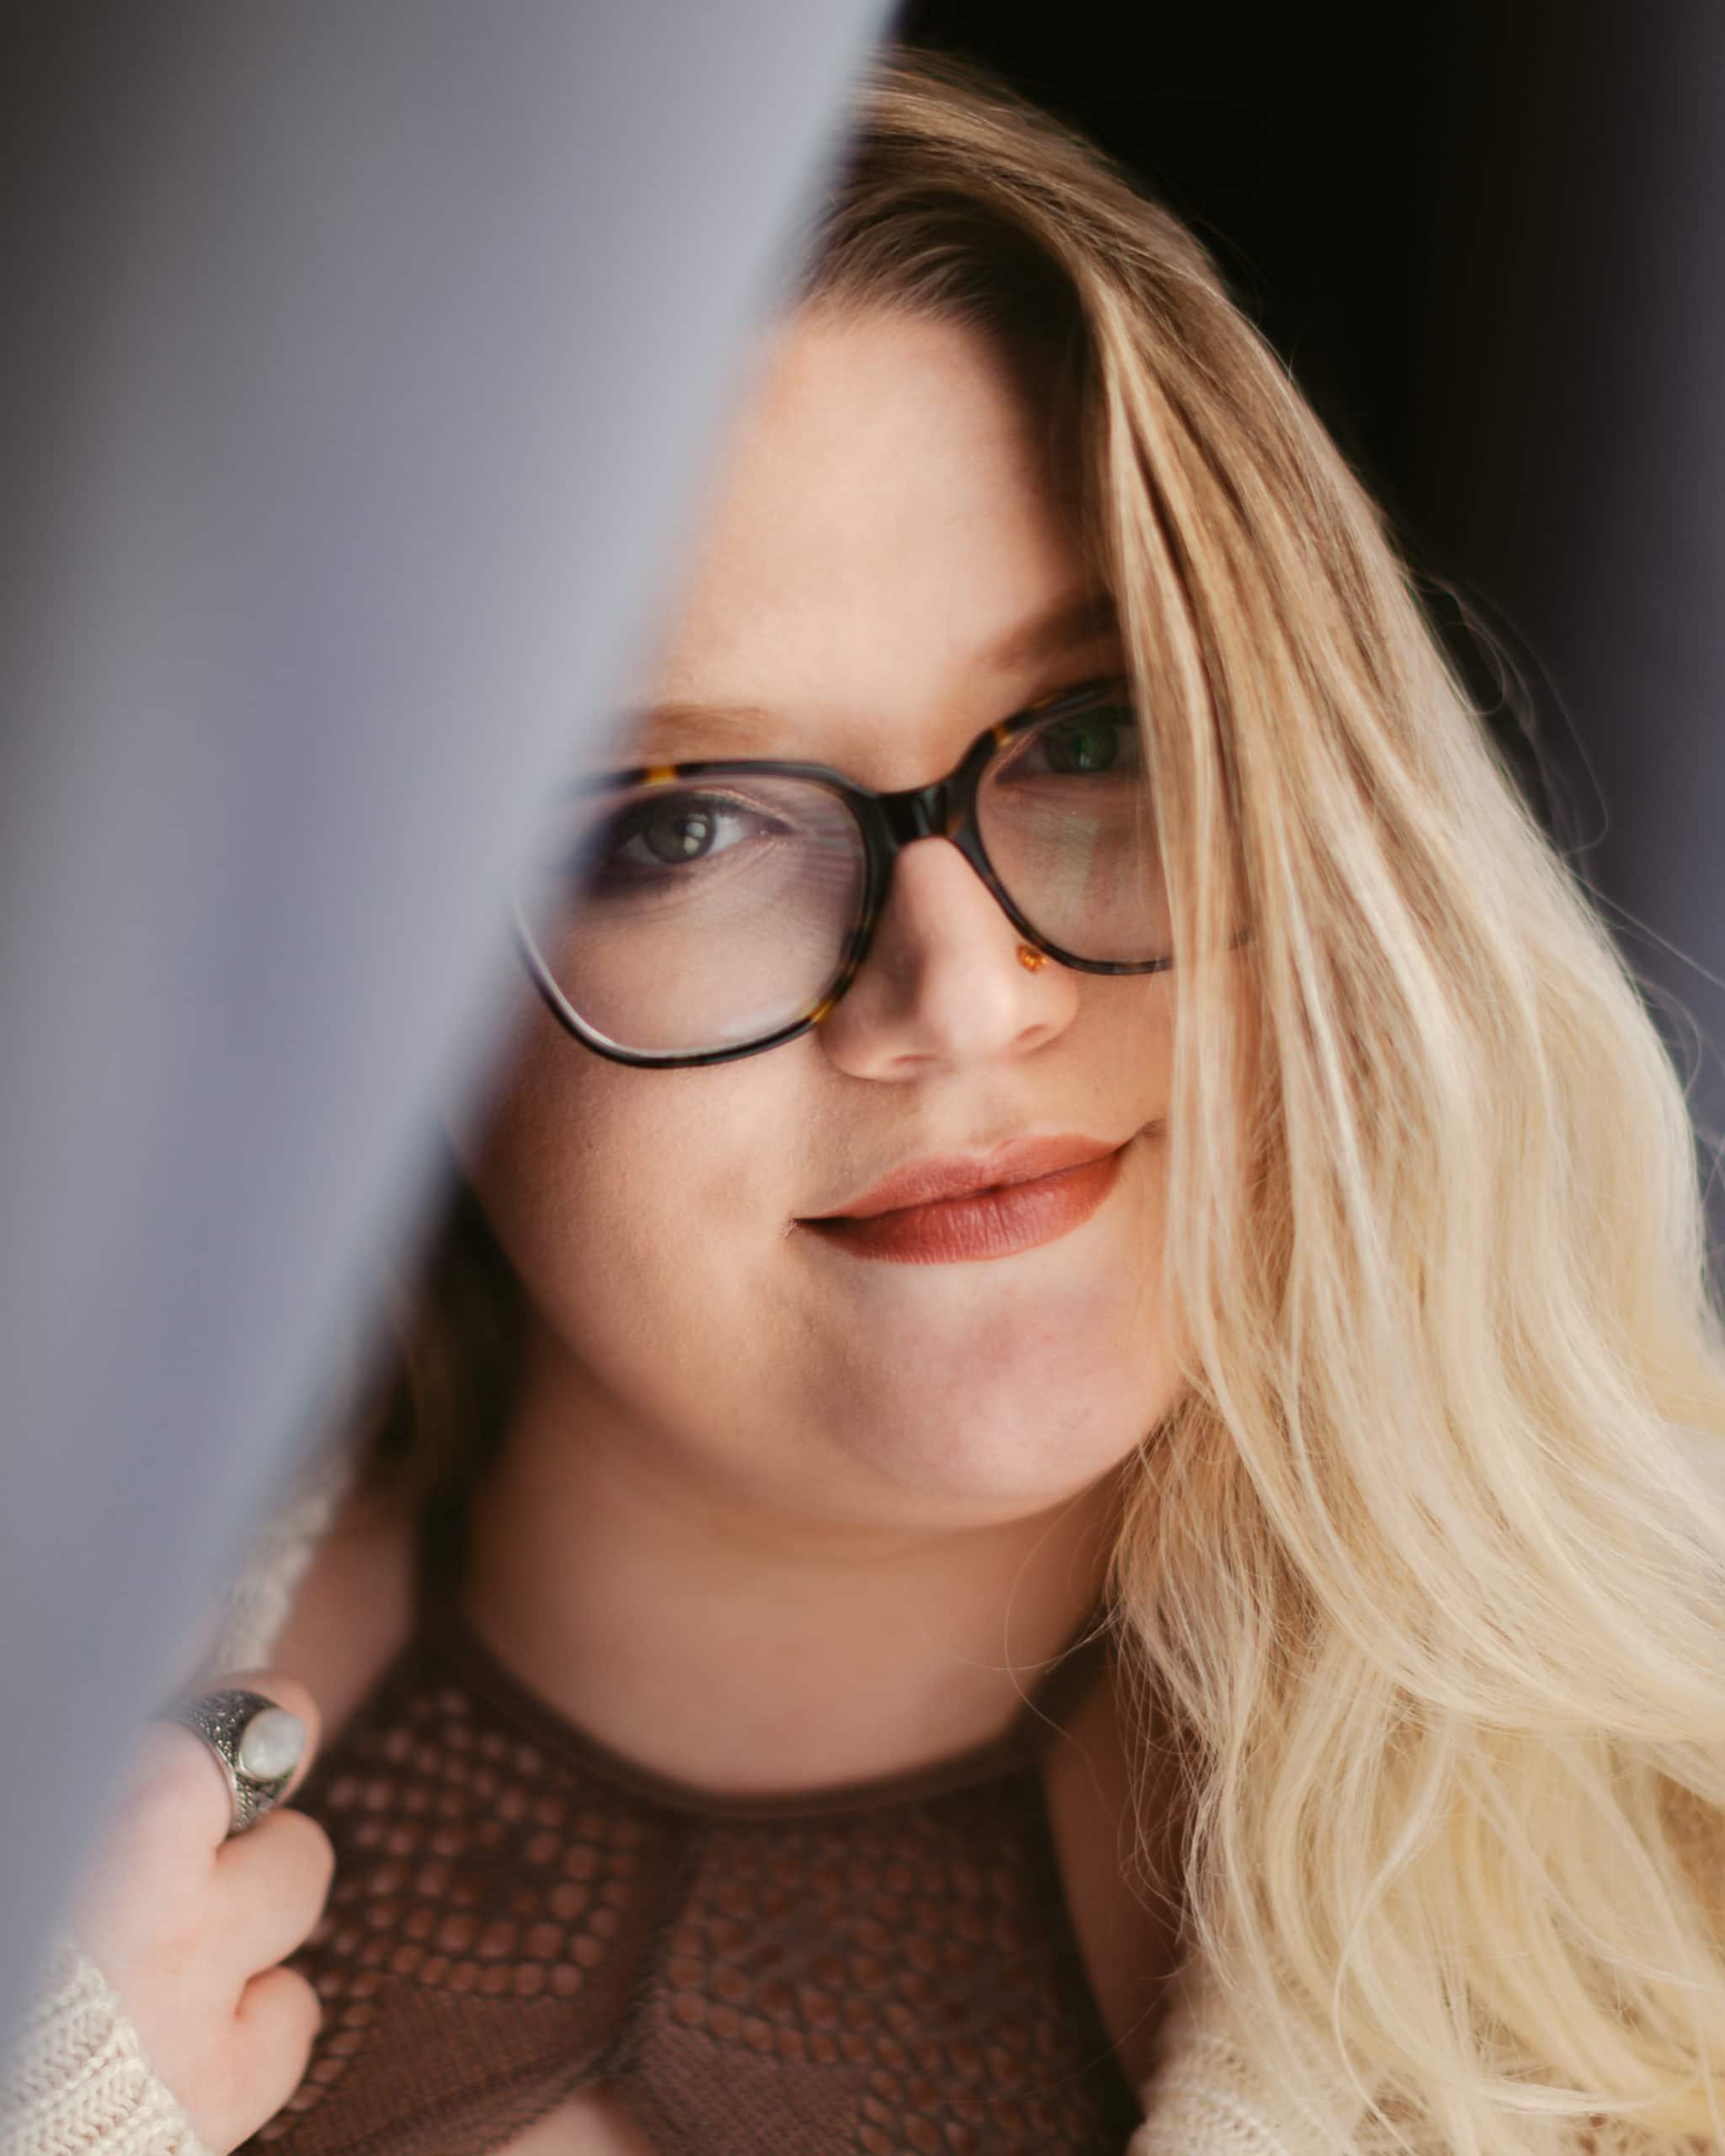 Blond woman wearing glasses